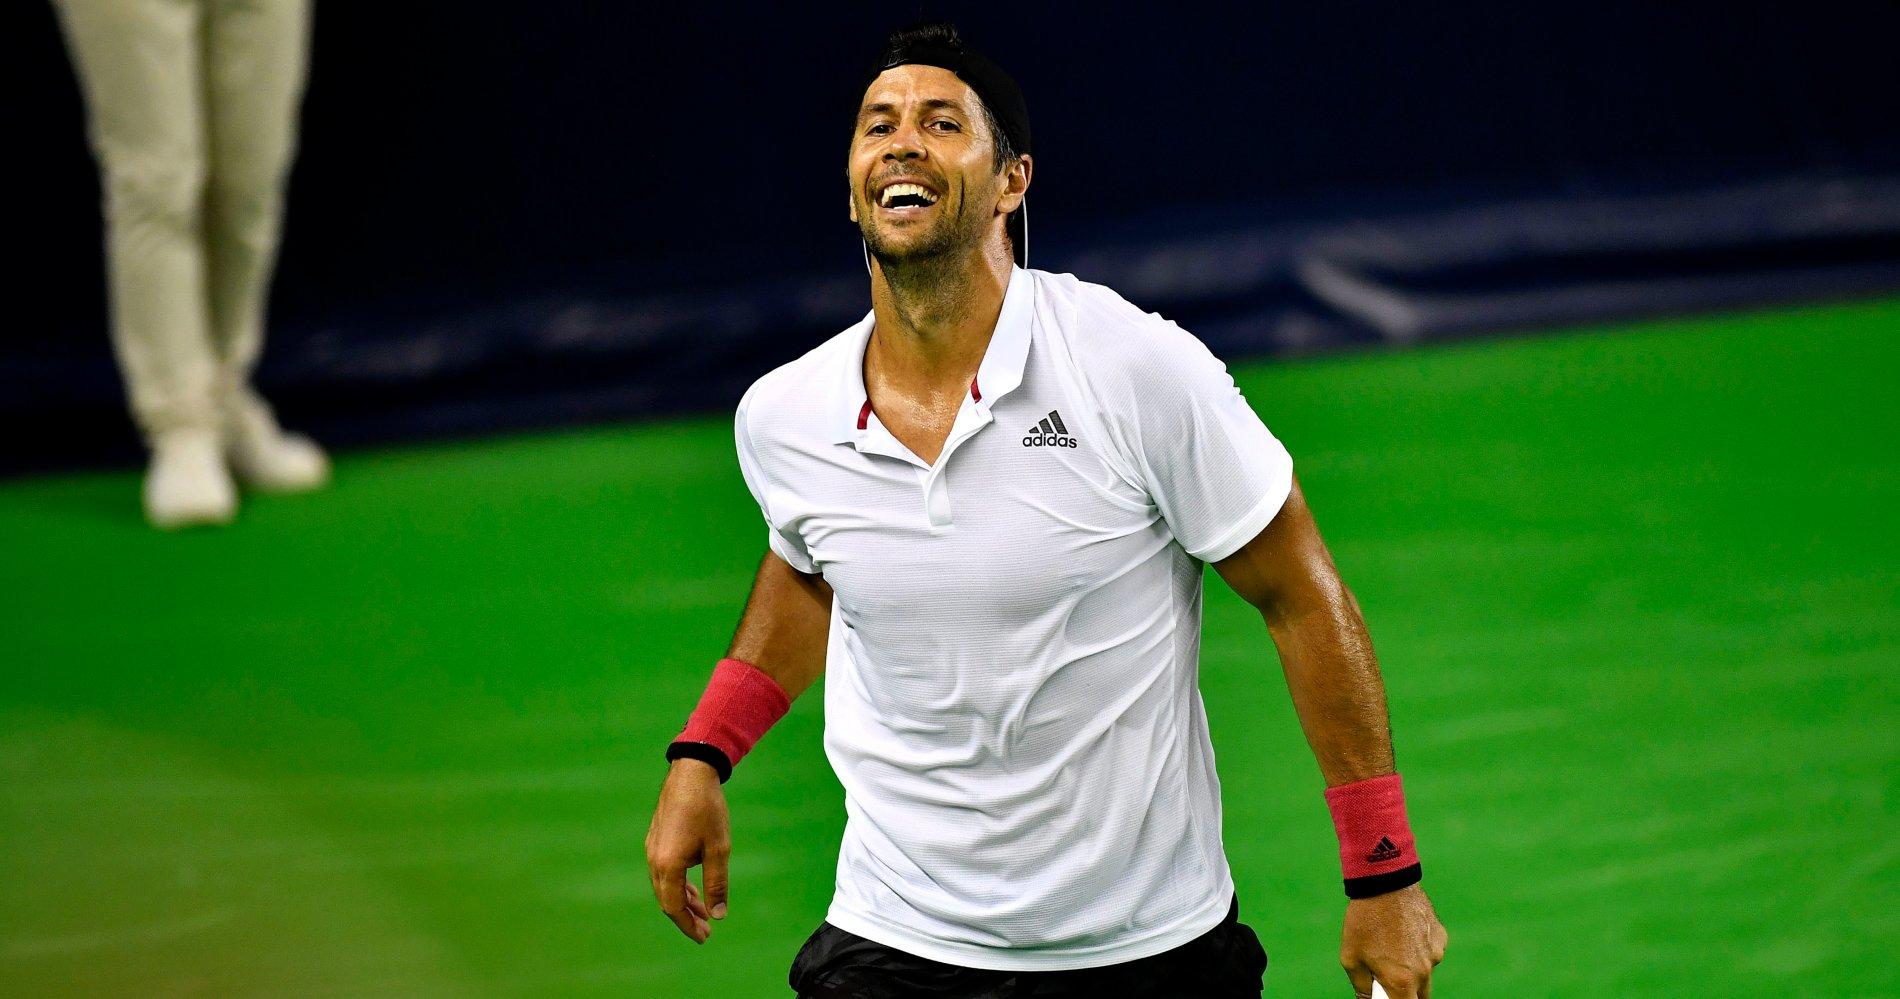 Fernando Verdasco won against Paire - UTS 2 - July 26 2020